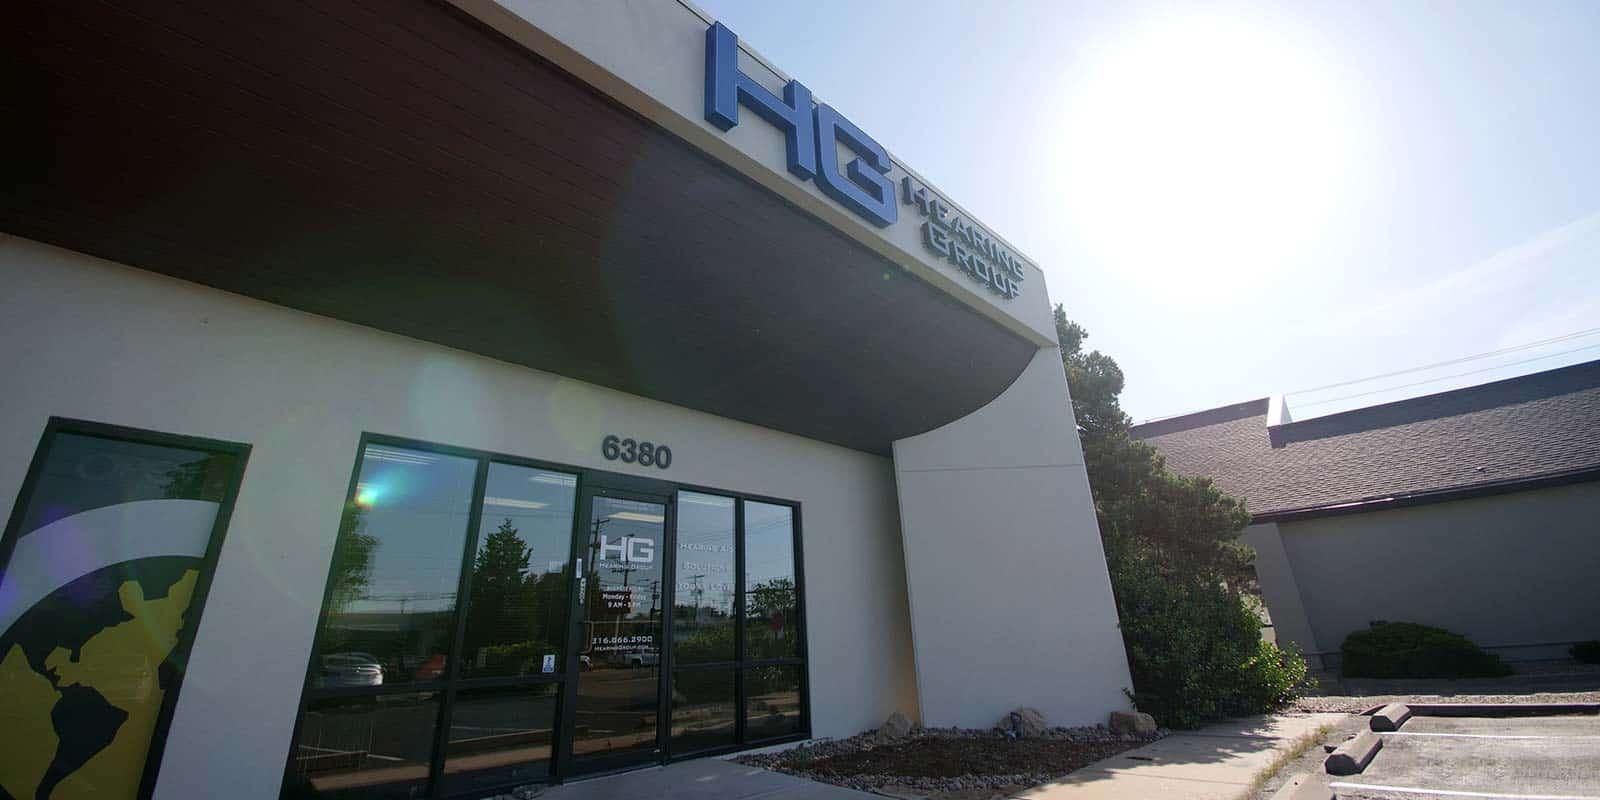 Hearing Group East Wichita, KS Storefront